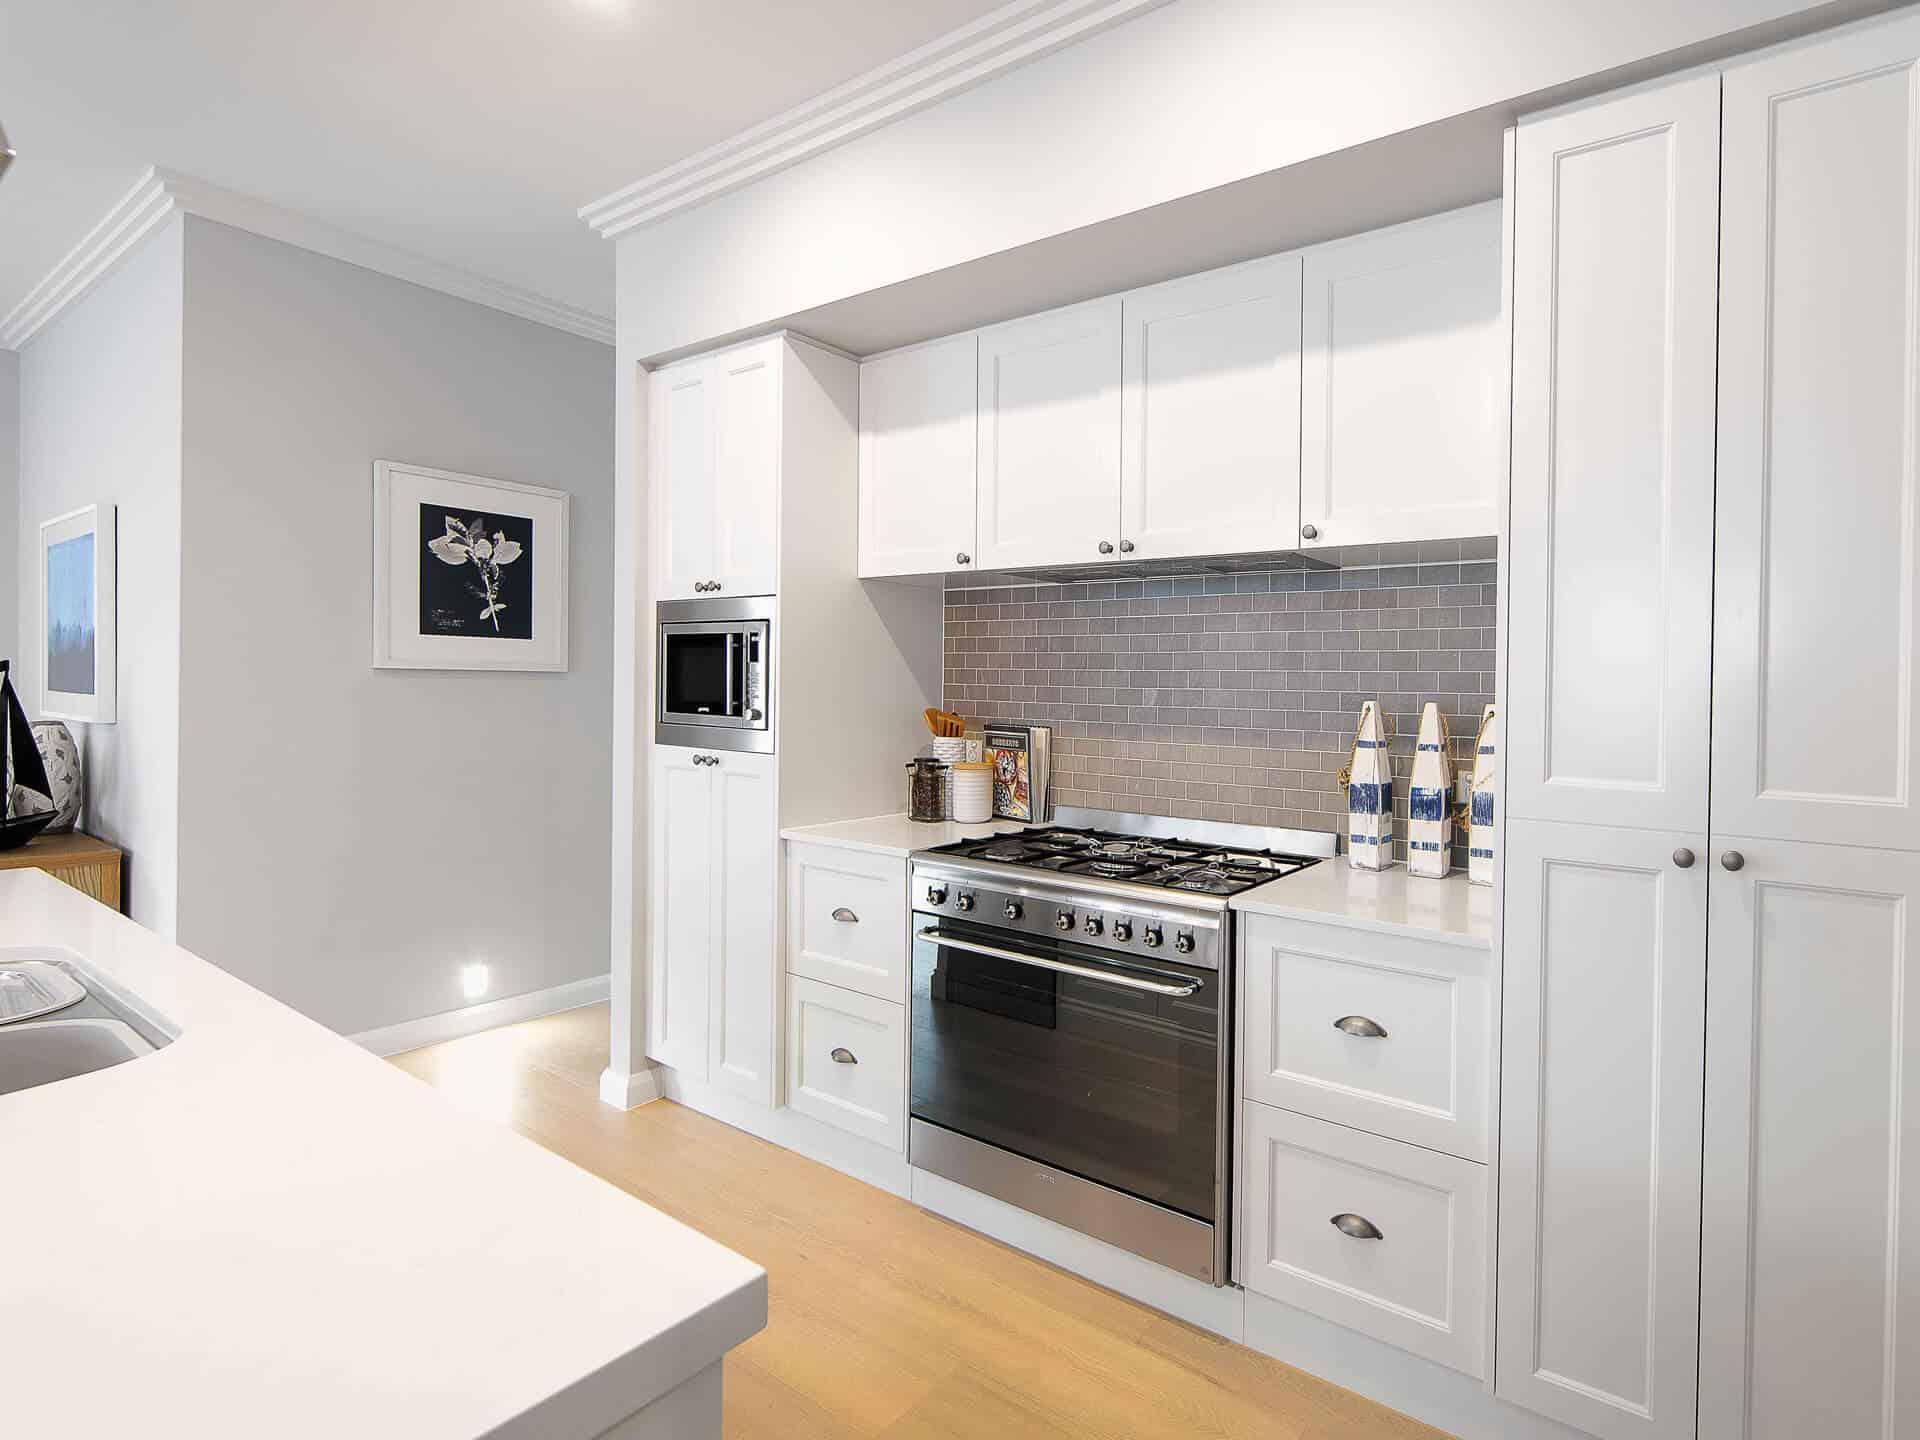 Superb Kitchen Renovations This Summer Bjfjoinery Download Free Architecture Designs Embacsunscenecom